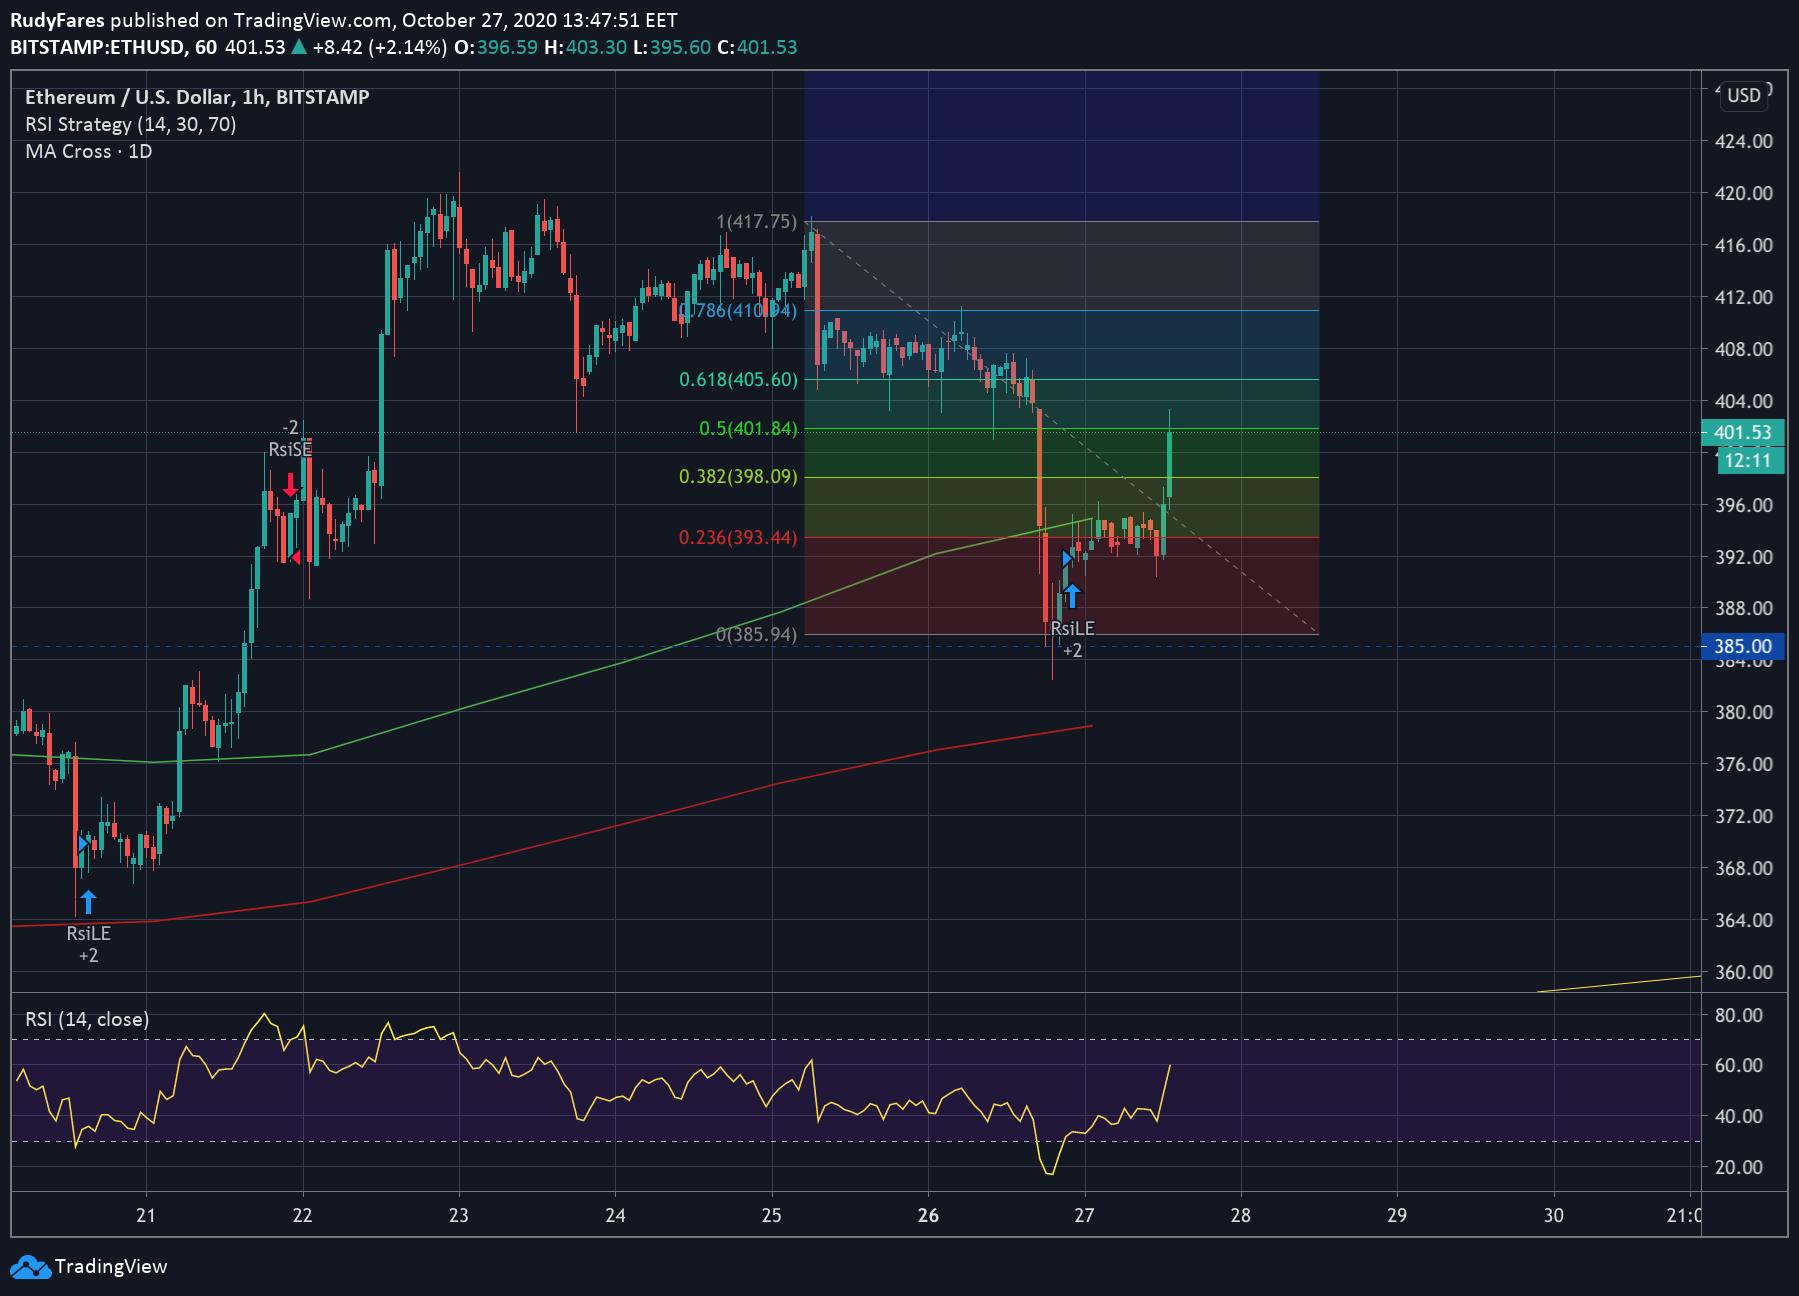 ETH/USD price 1H chart showing the Fibonacci retracement levels